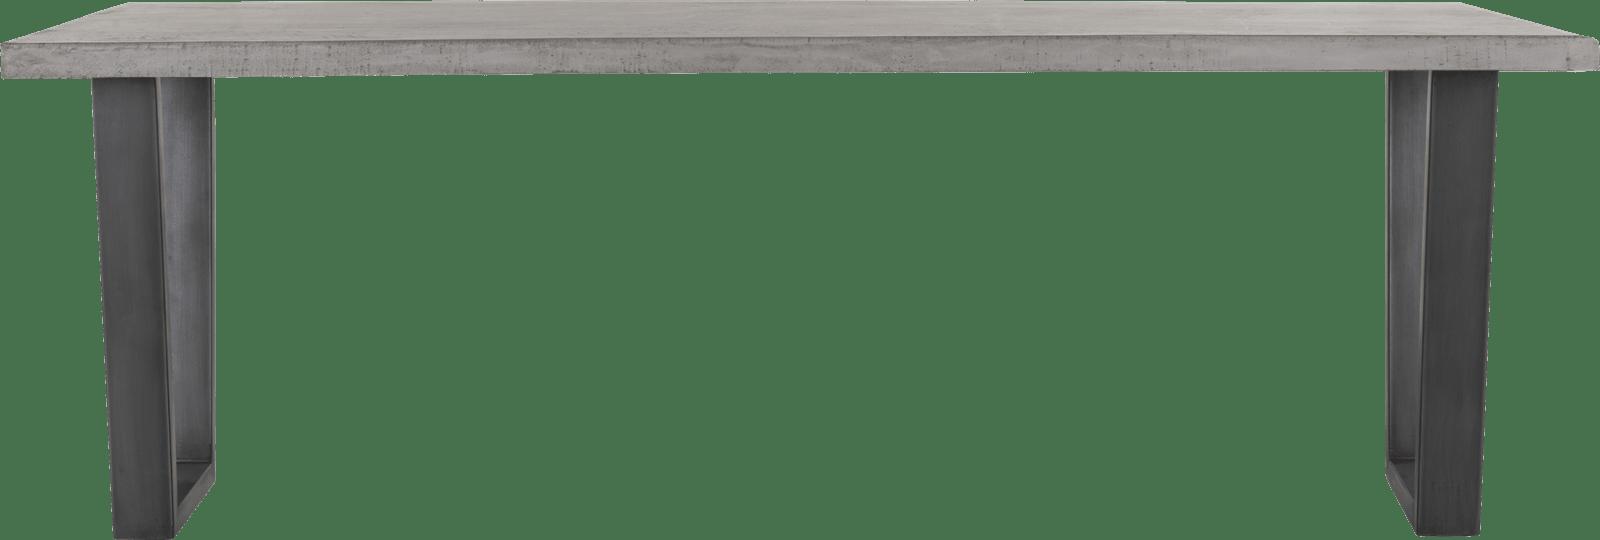 Farmero - eetkamertafel 180 x 100 cm